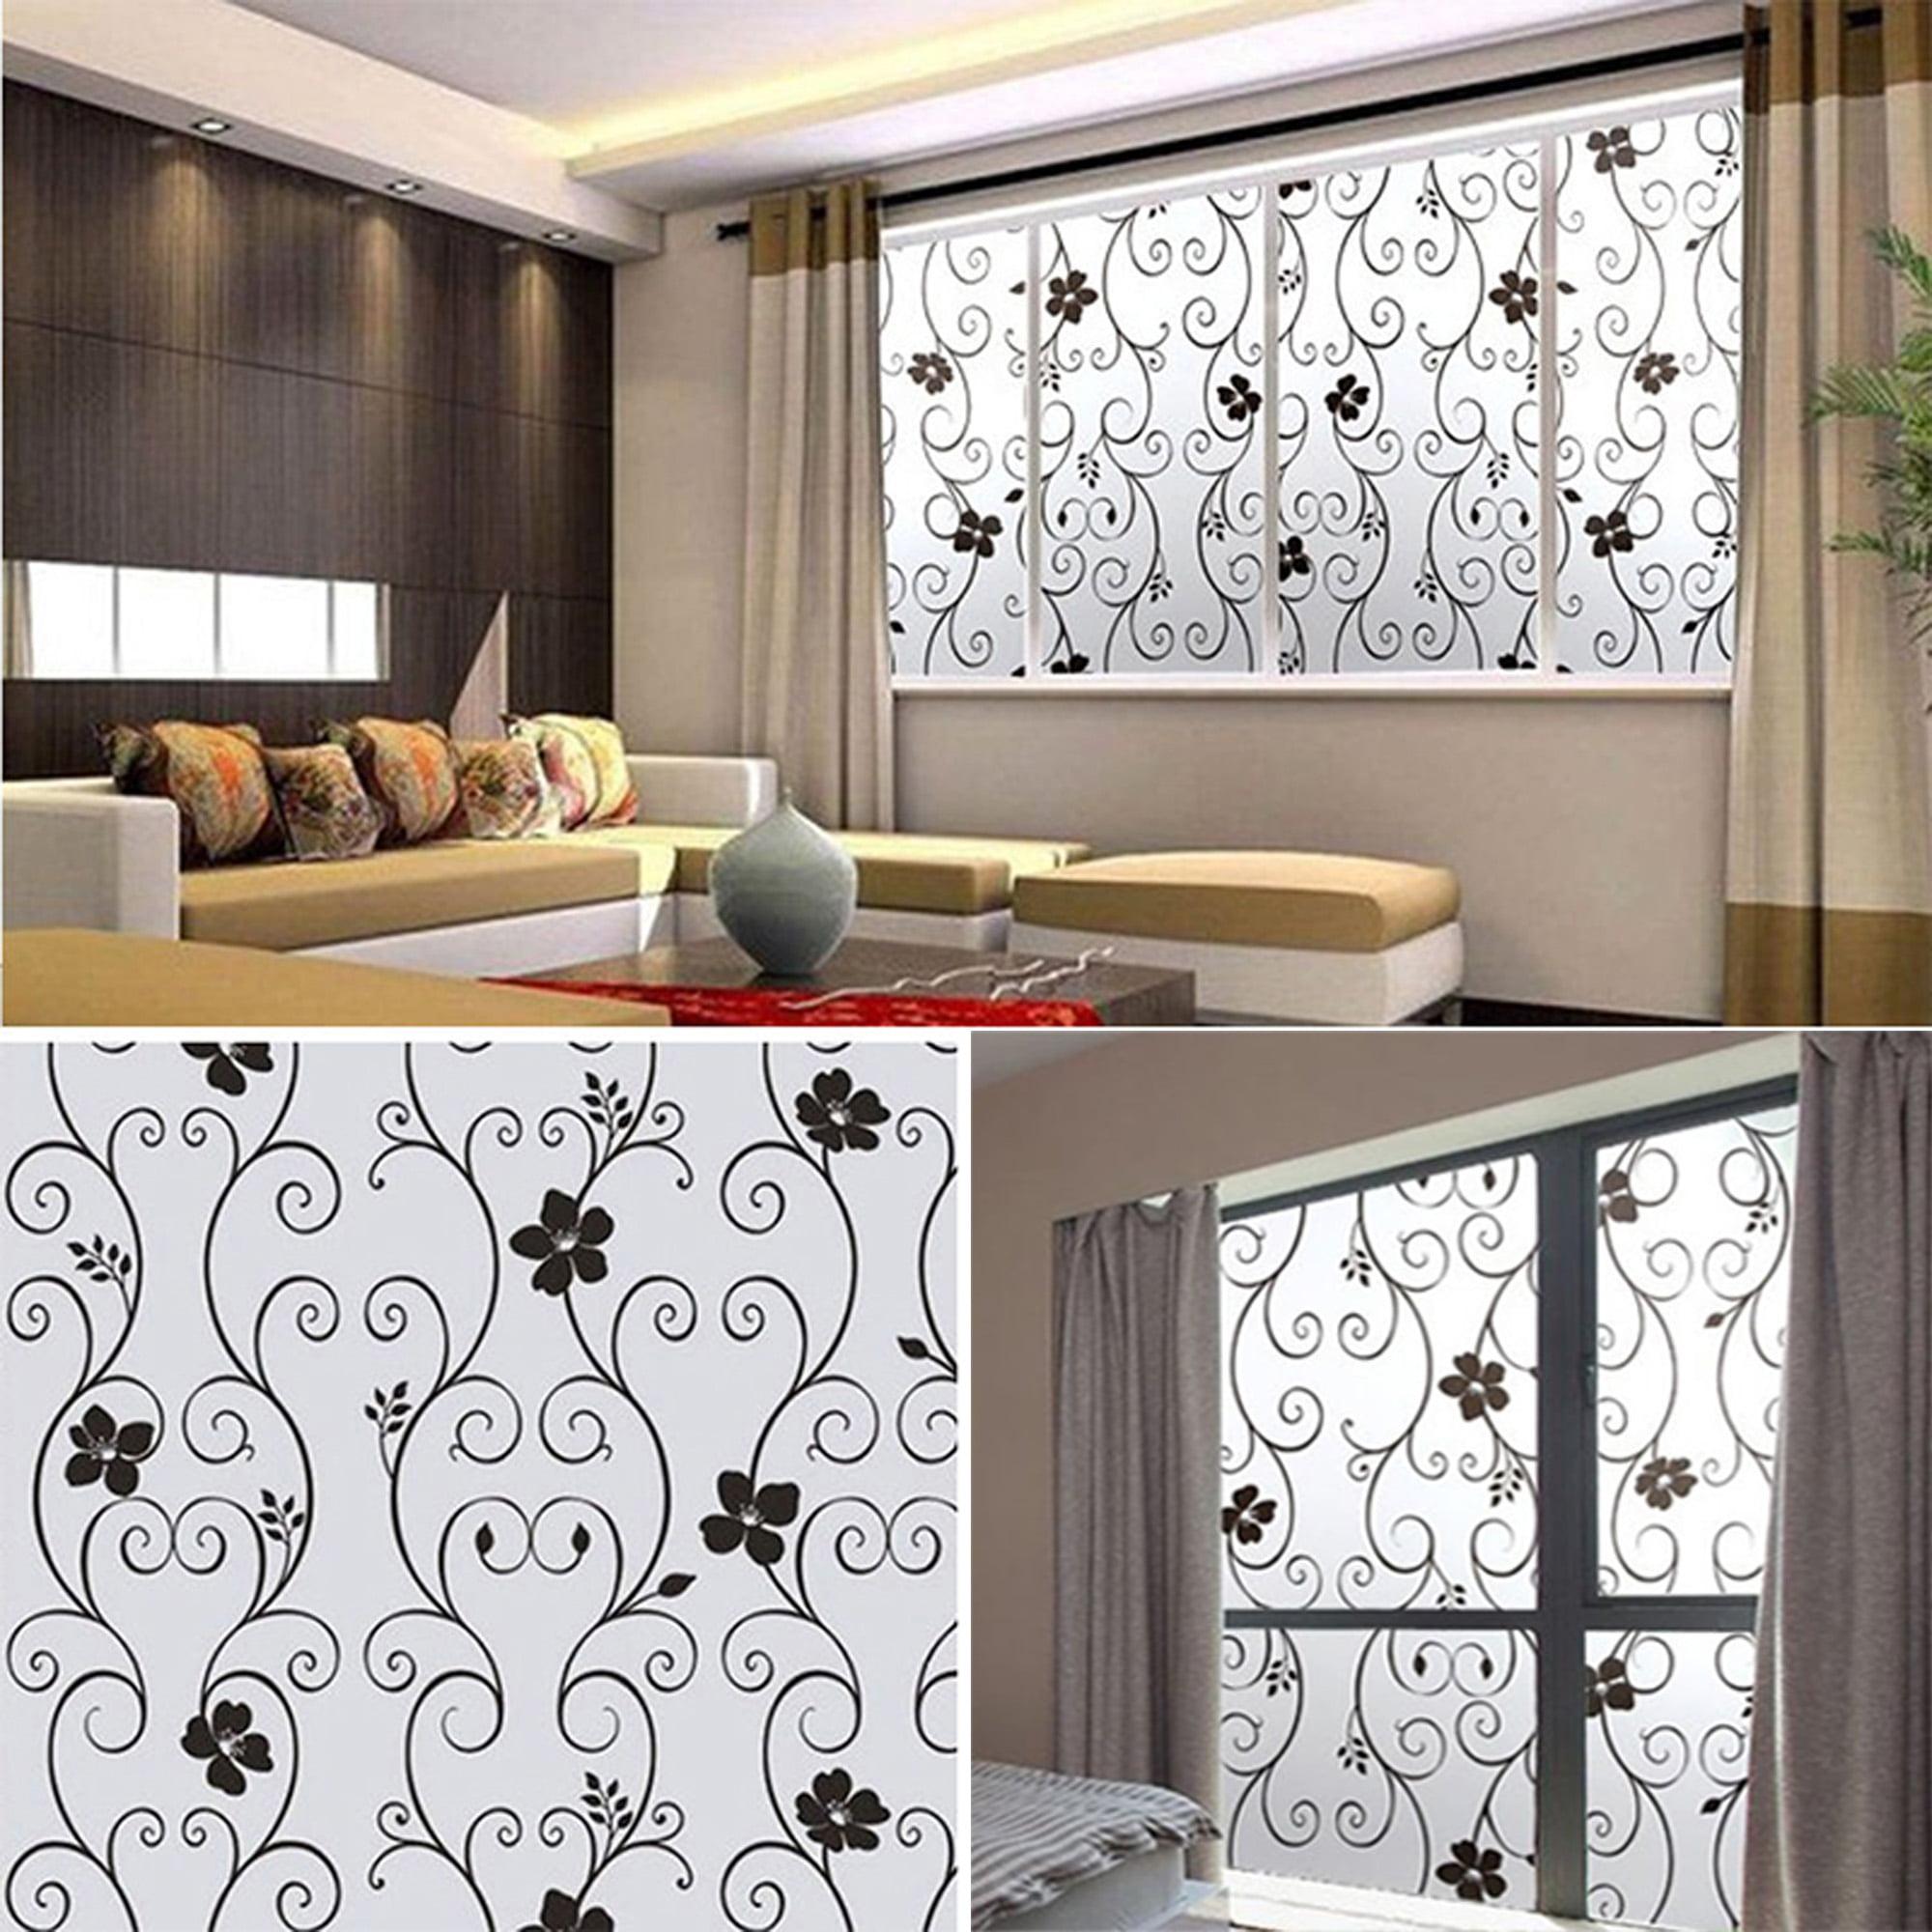 Dodoing Waterproof Frosted Glass Films Window Film Door Film Sticker Uv Protection Home Bedroom Bathroom Protect Privacy Decor Walmart Com Walmart Com